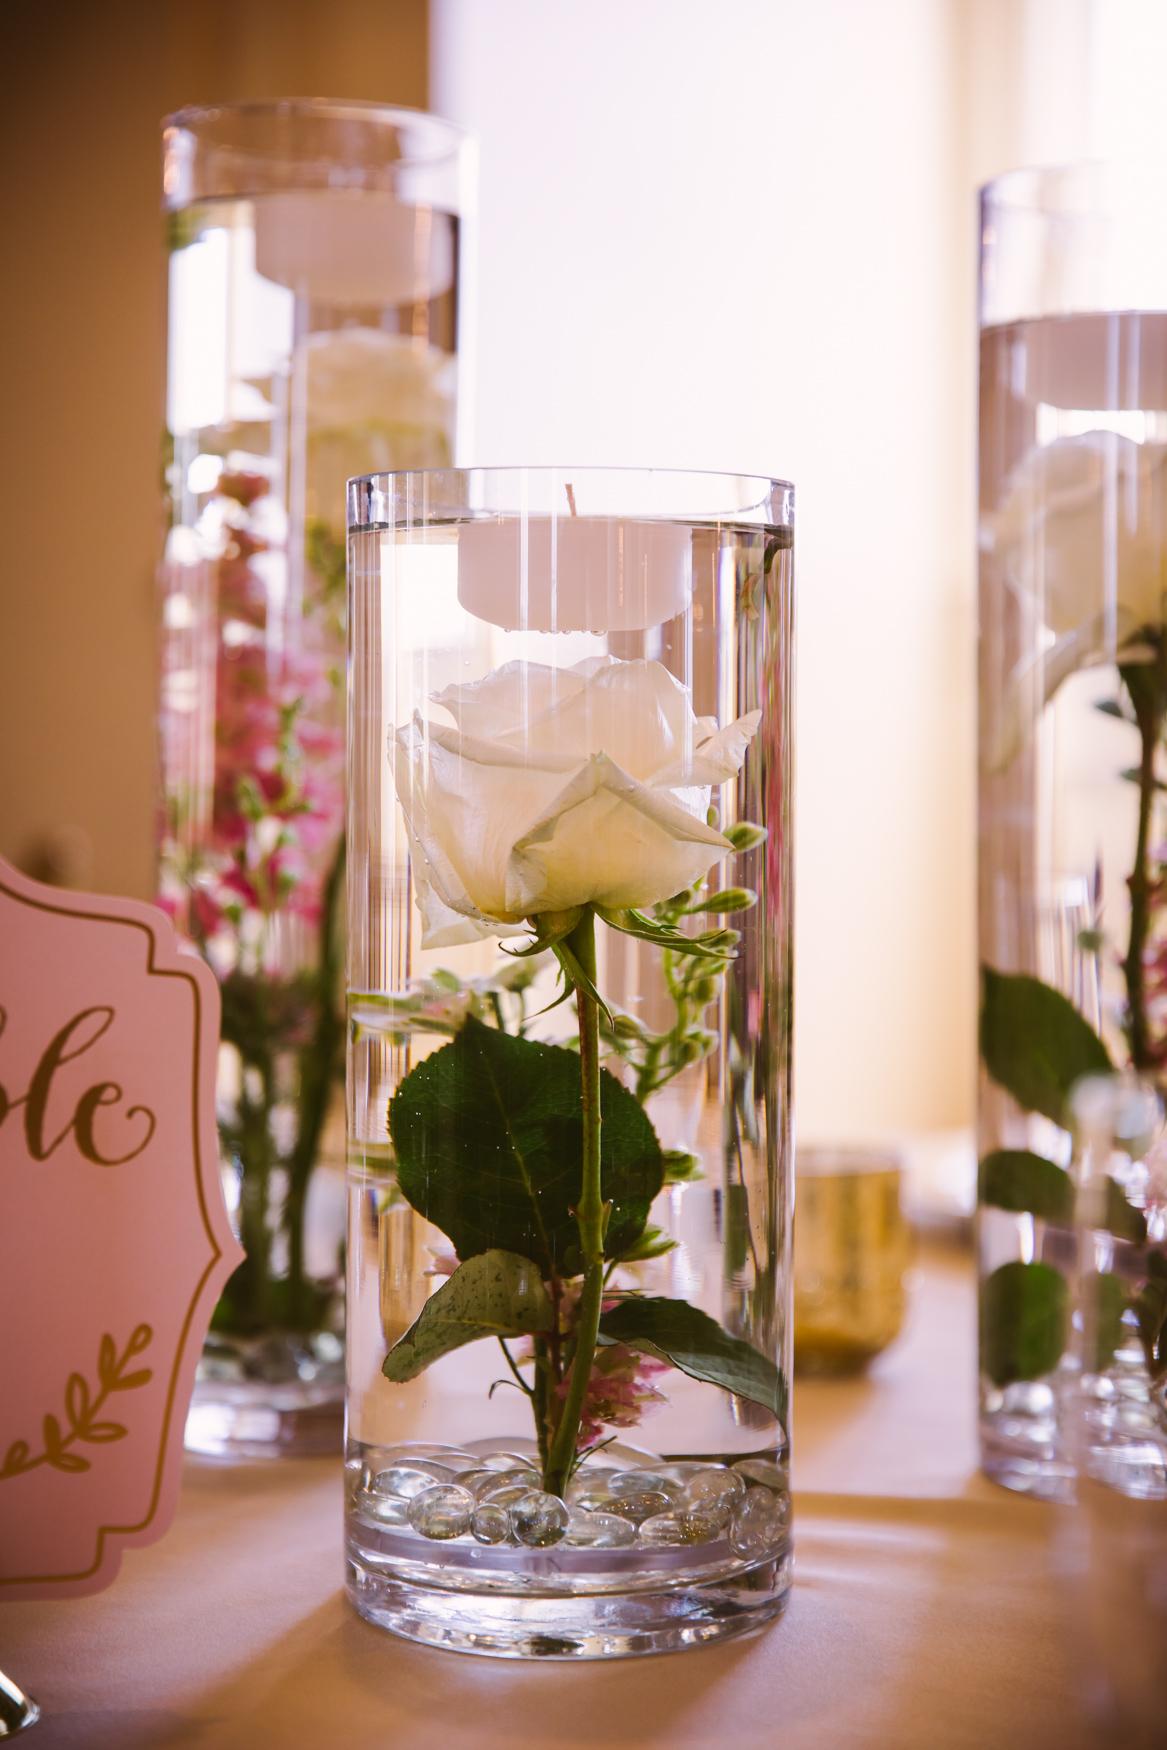 Waynesville Wedding Photography | Flower in Vase Table Centerpiece